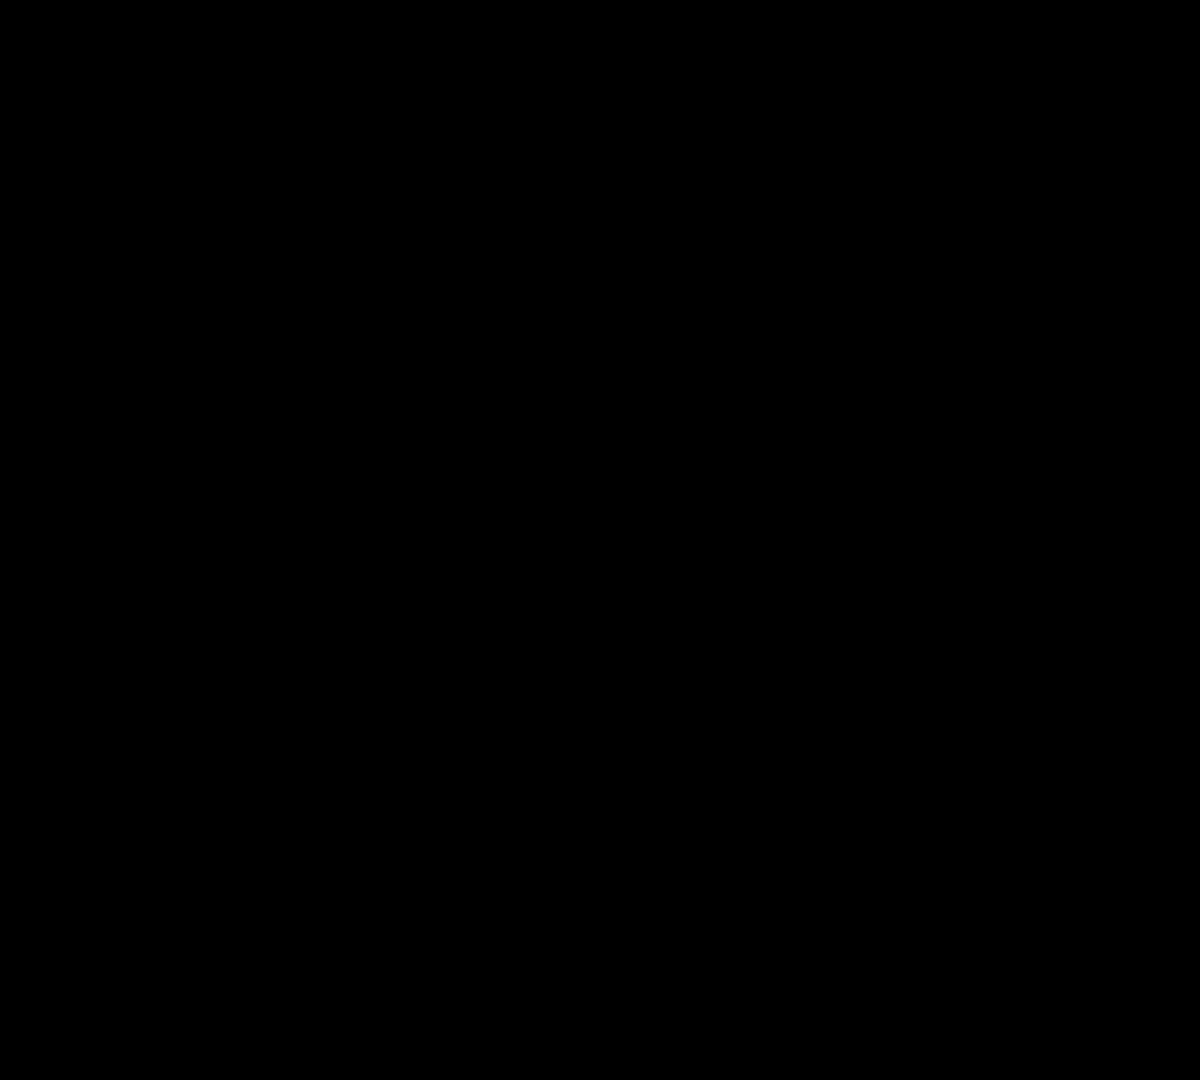 Logo of the Internal Revenue Service